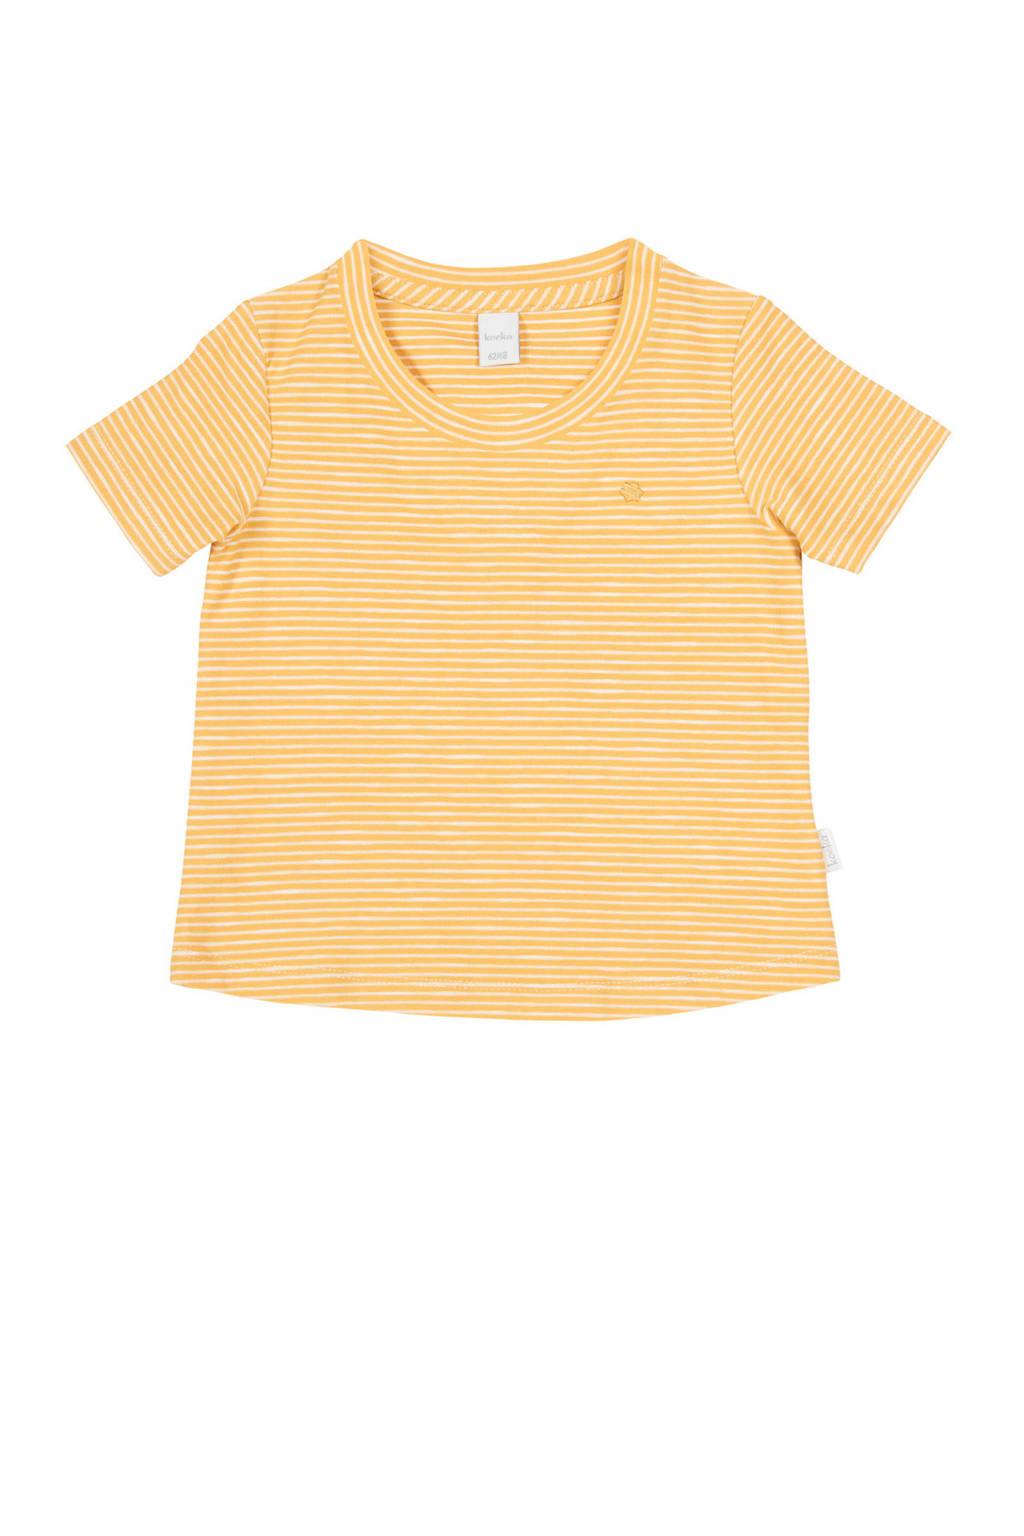 Koeka newborn baby gestreept T-shirt Linescape oker, Oker/wit